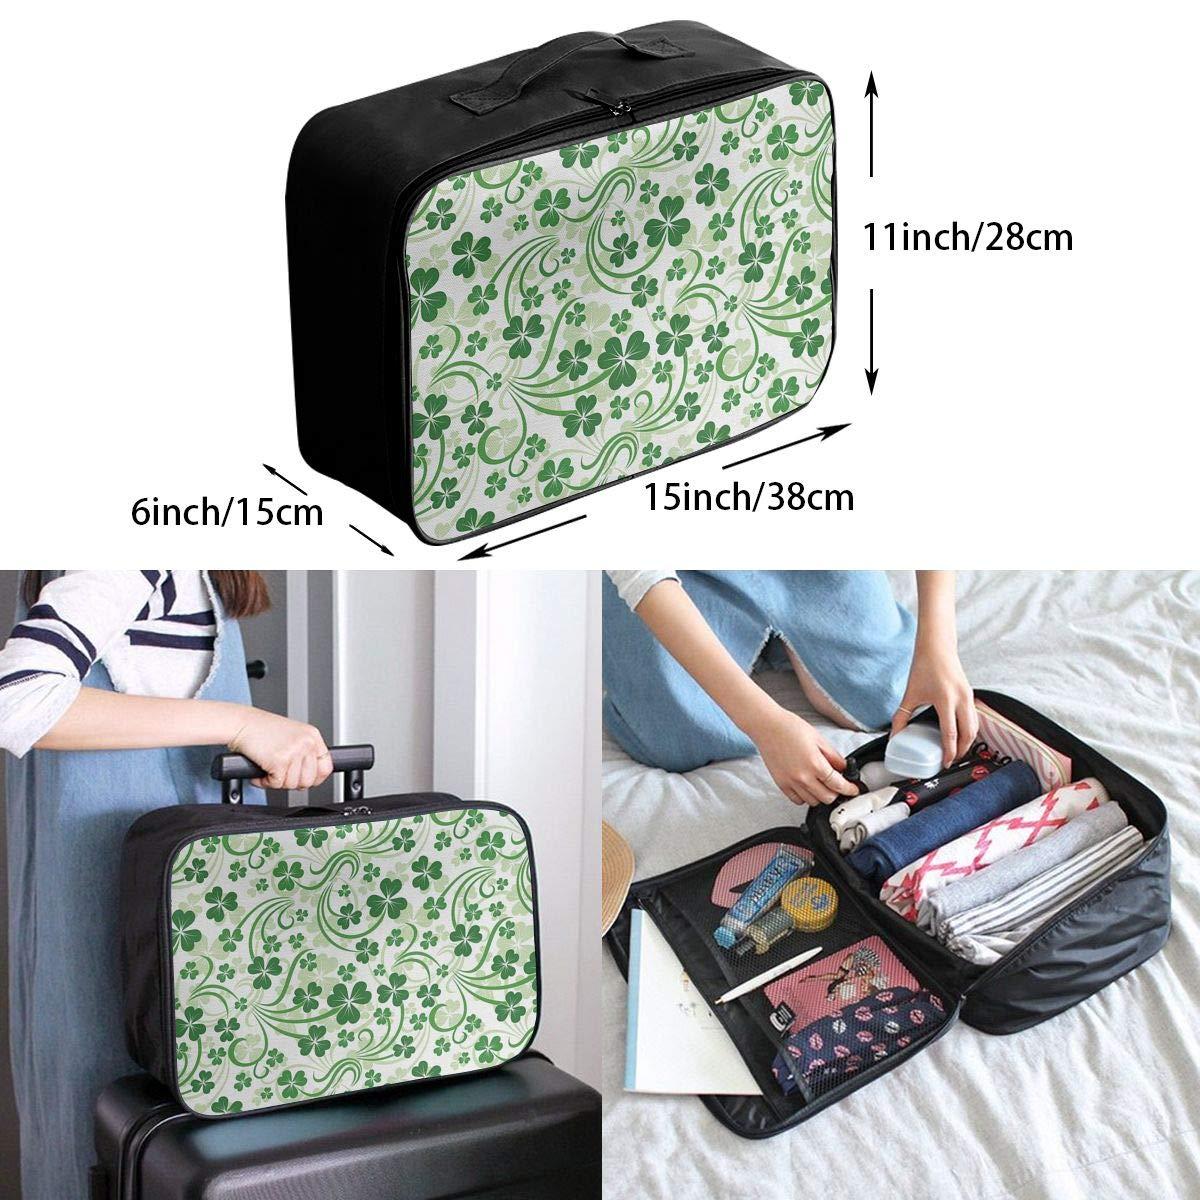 ADGAI Lucky Celtic Clovers Swirls Canvas Travel Weekender Bag,Fashion Custom Lightweight Large Capacity Portable Luggage Bag,Suitcase Trolley Bag